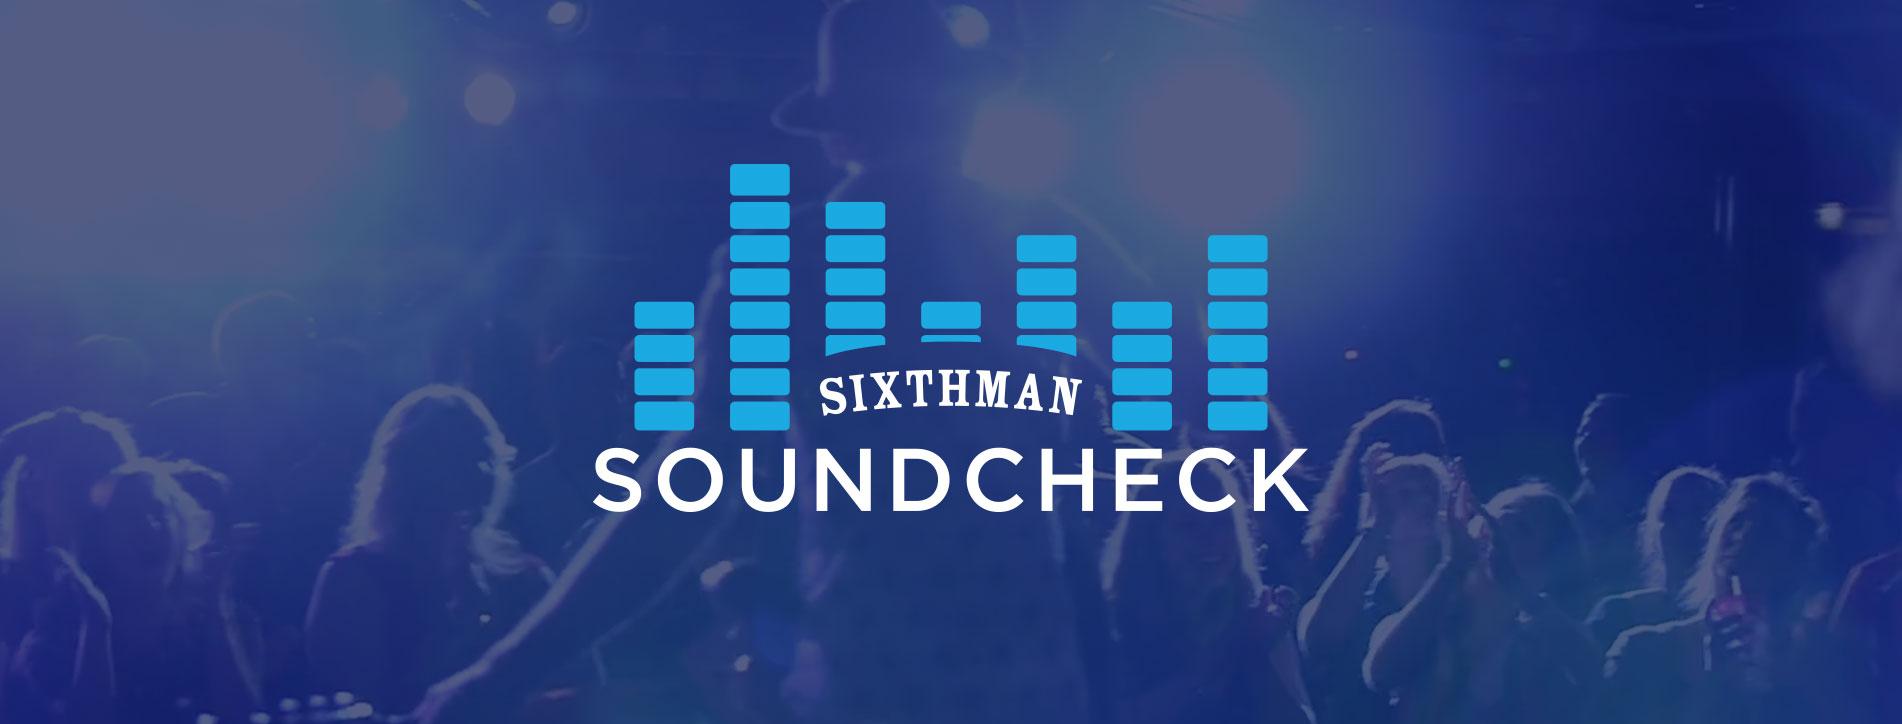 Sixthman Soundcheck